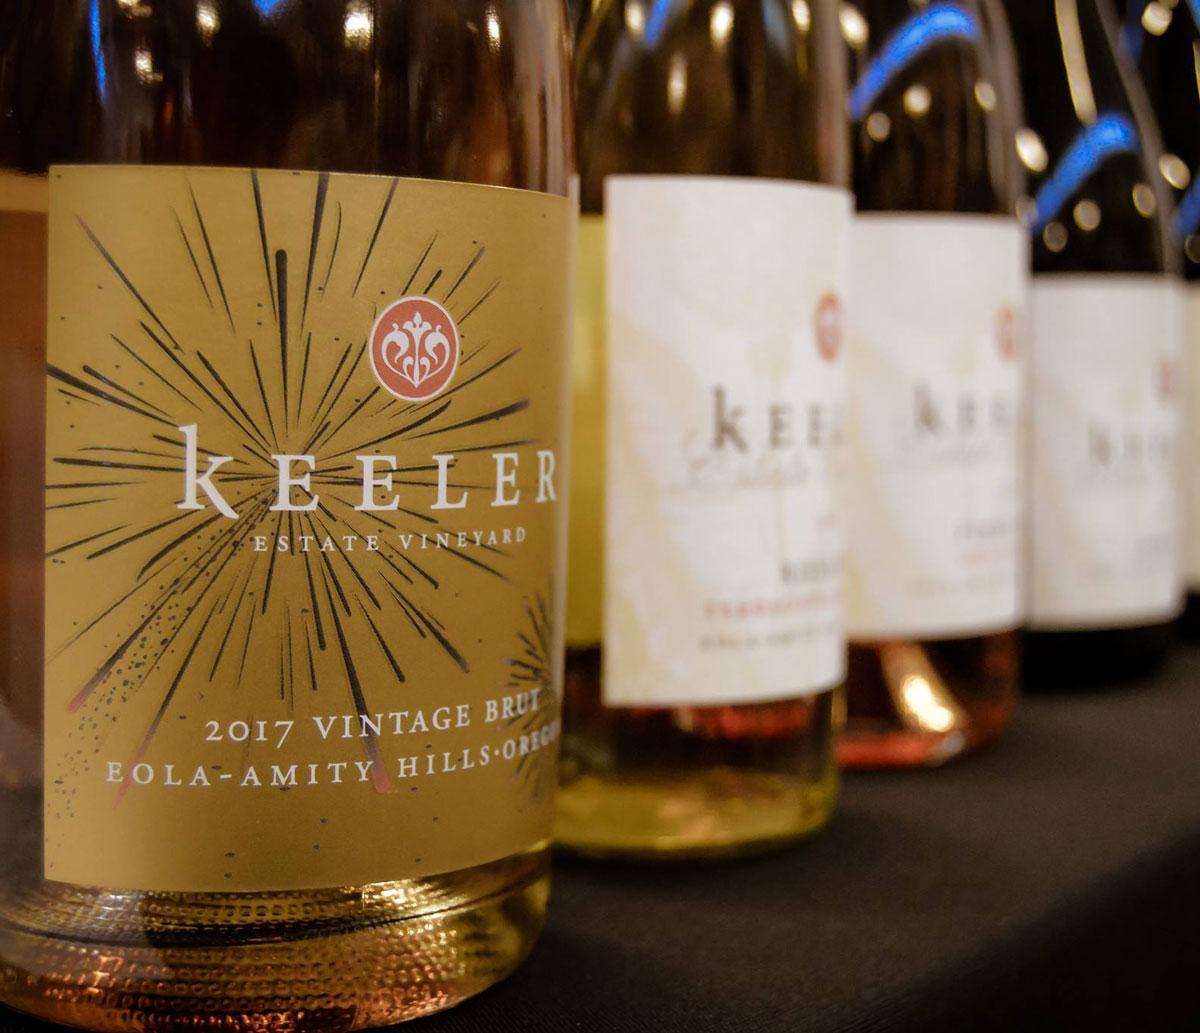 Keeler Bottle Shots